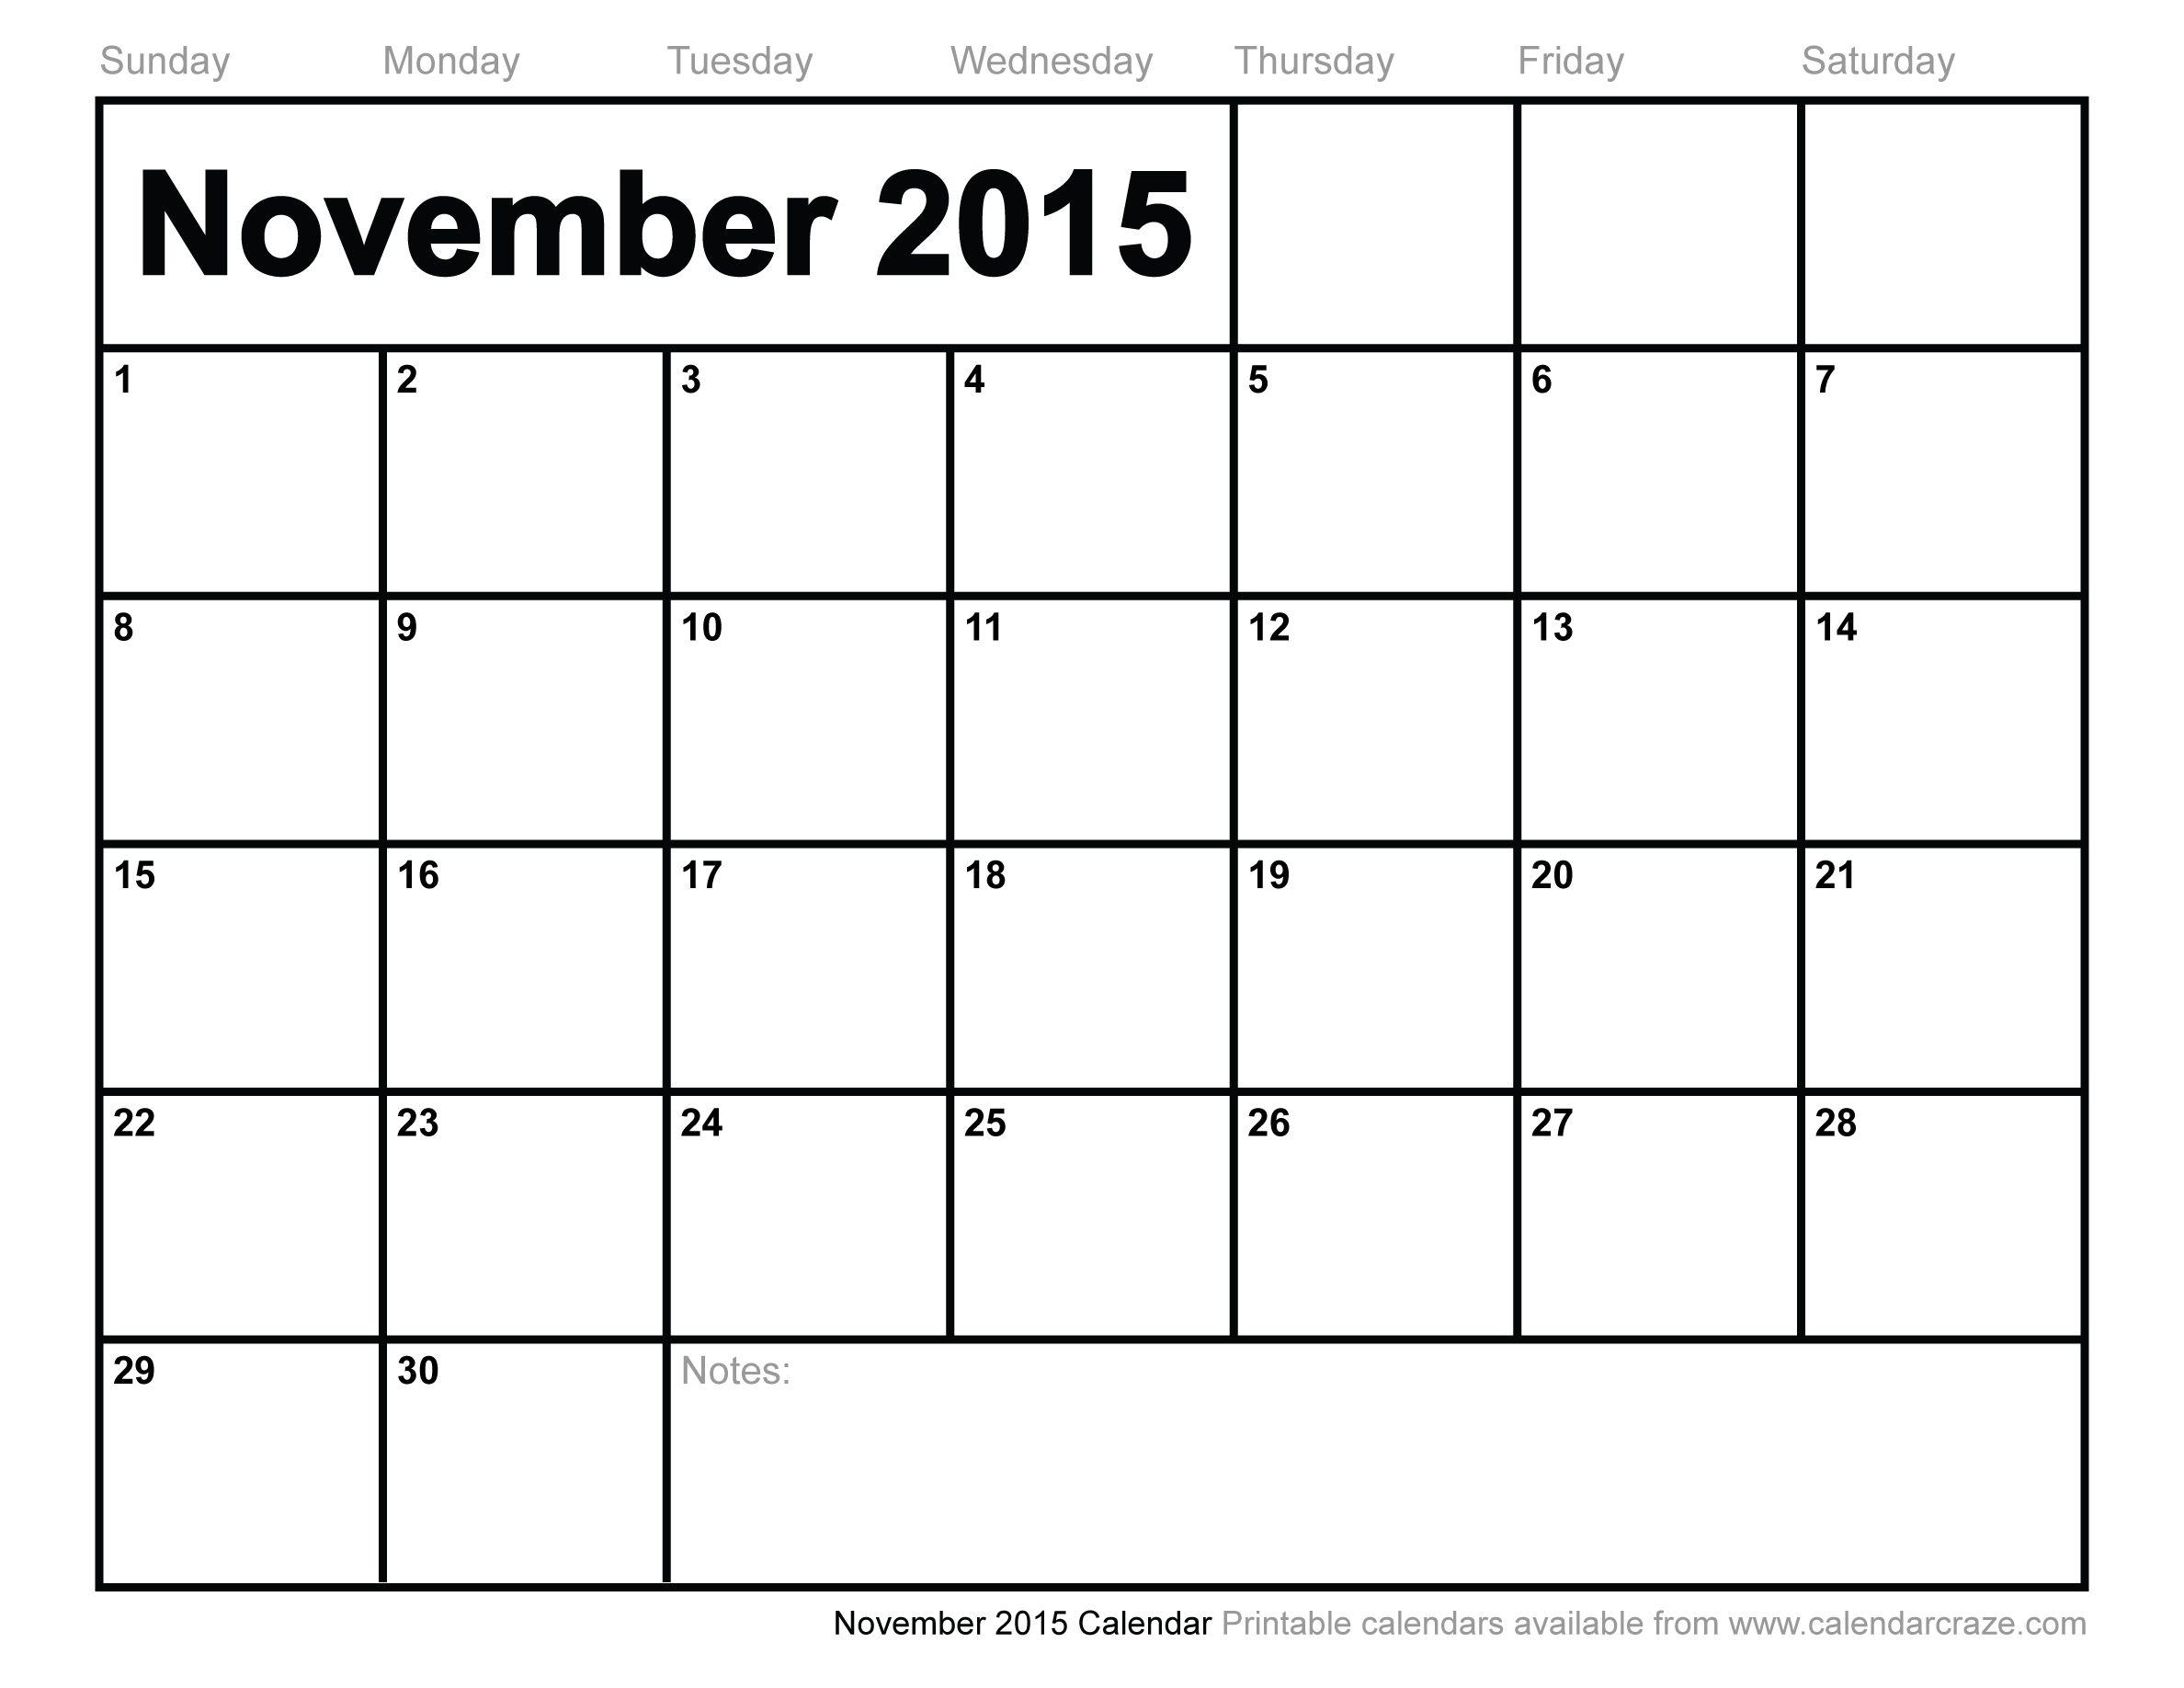 November 2015 Calendar Printable December 2015 Calendar Printable Downloads August Calendar June Calendar Printable Monthly Calendar Template